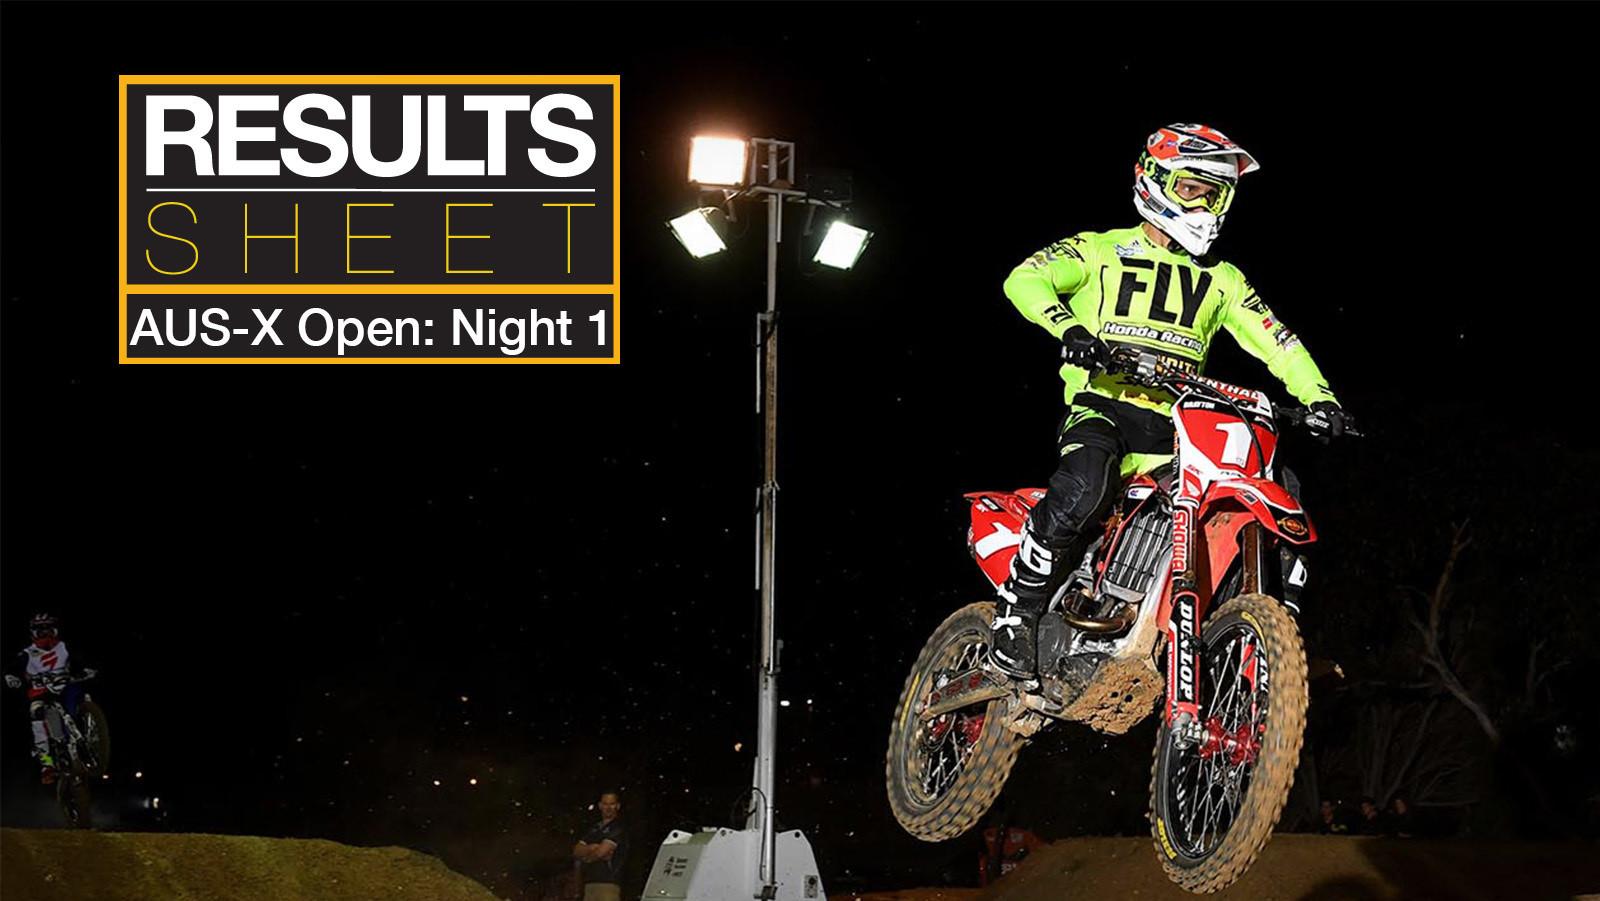 Results Sheet: 2017 Australian Supercross Championship - AUS-X Open Night 1